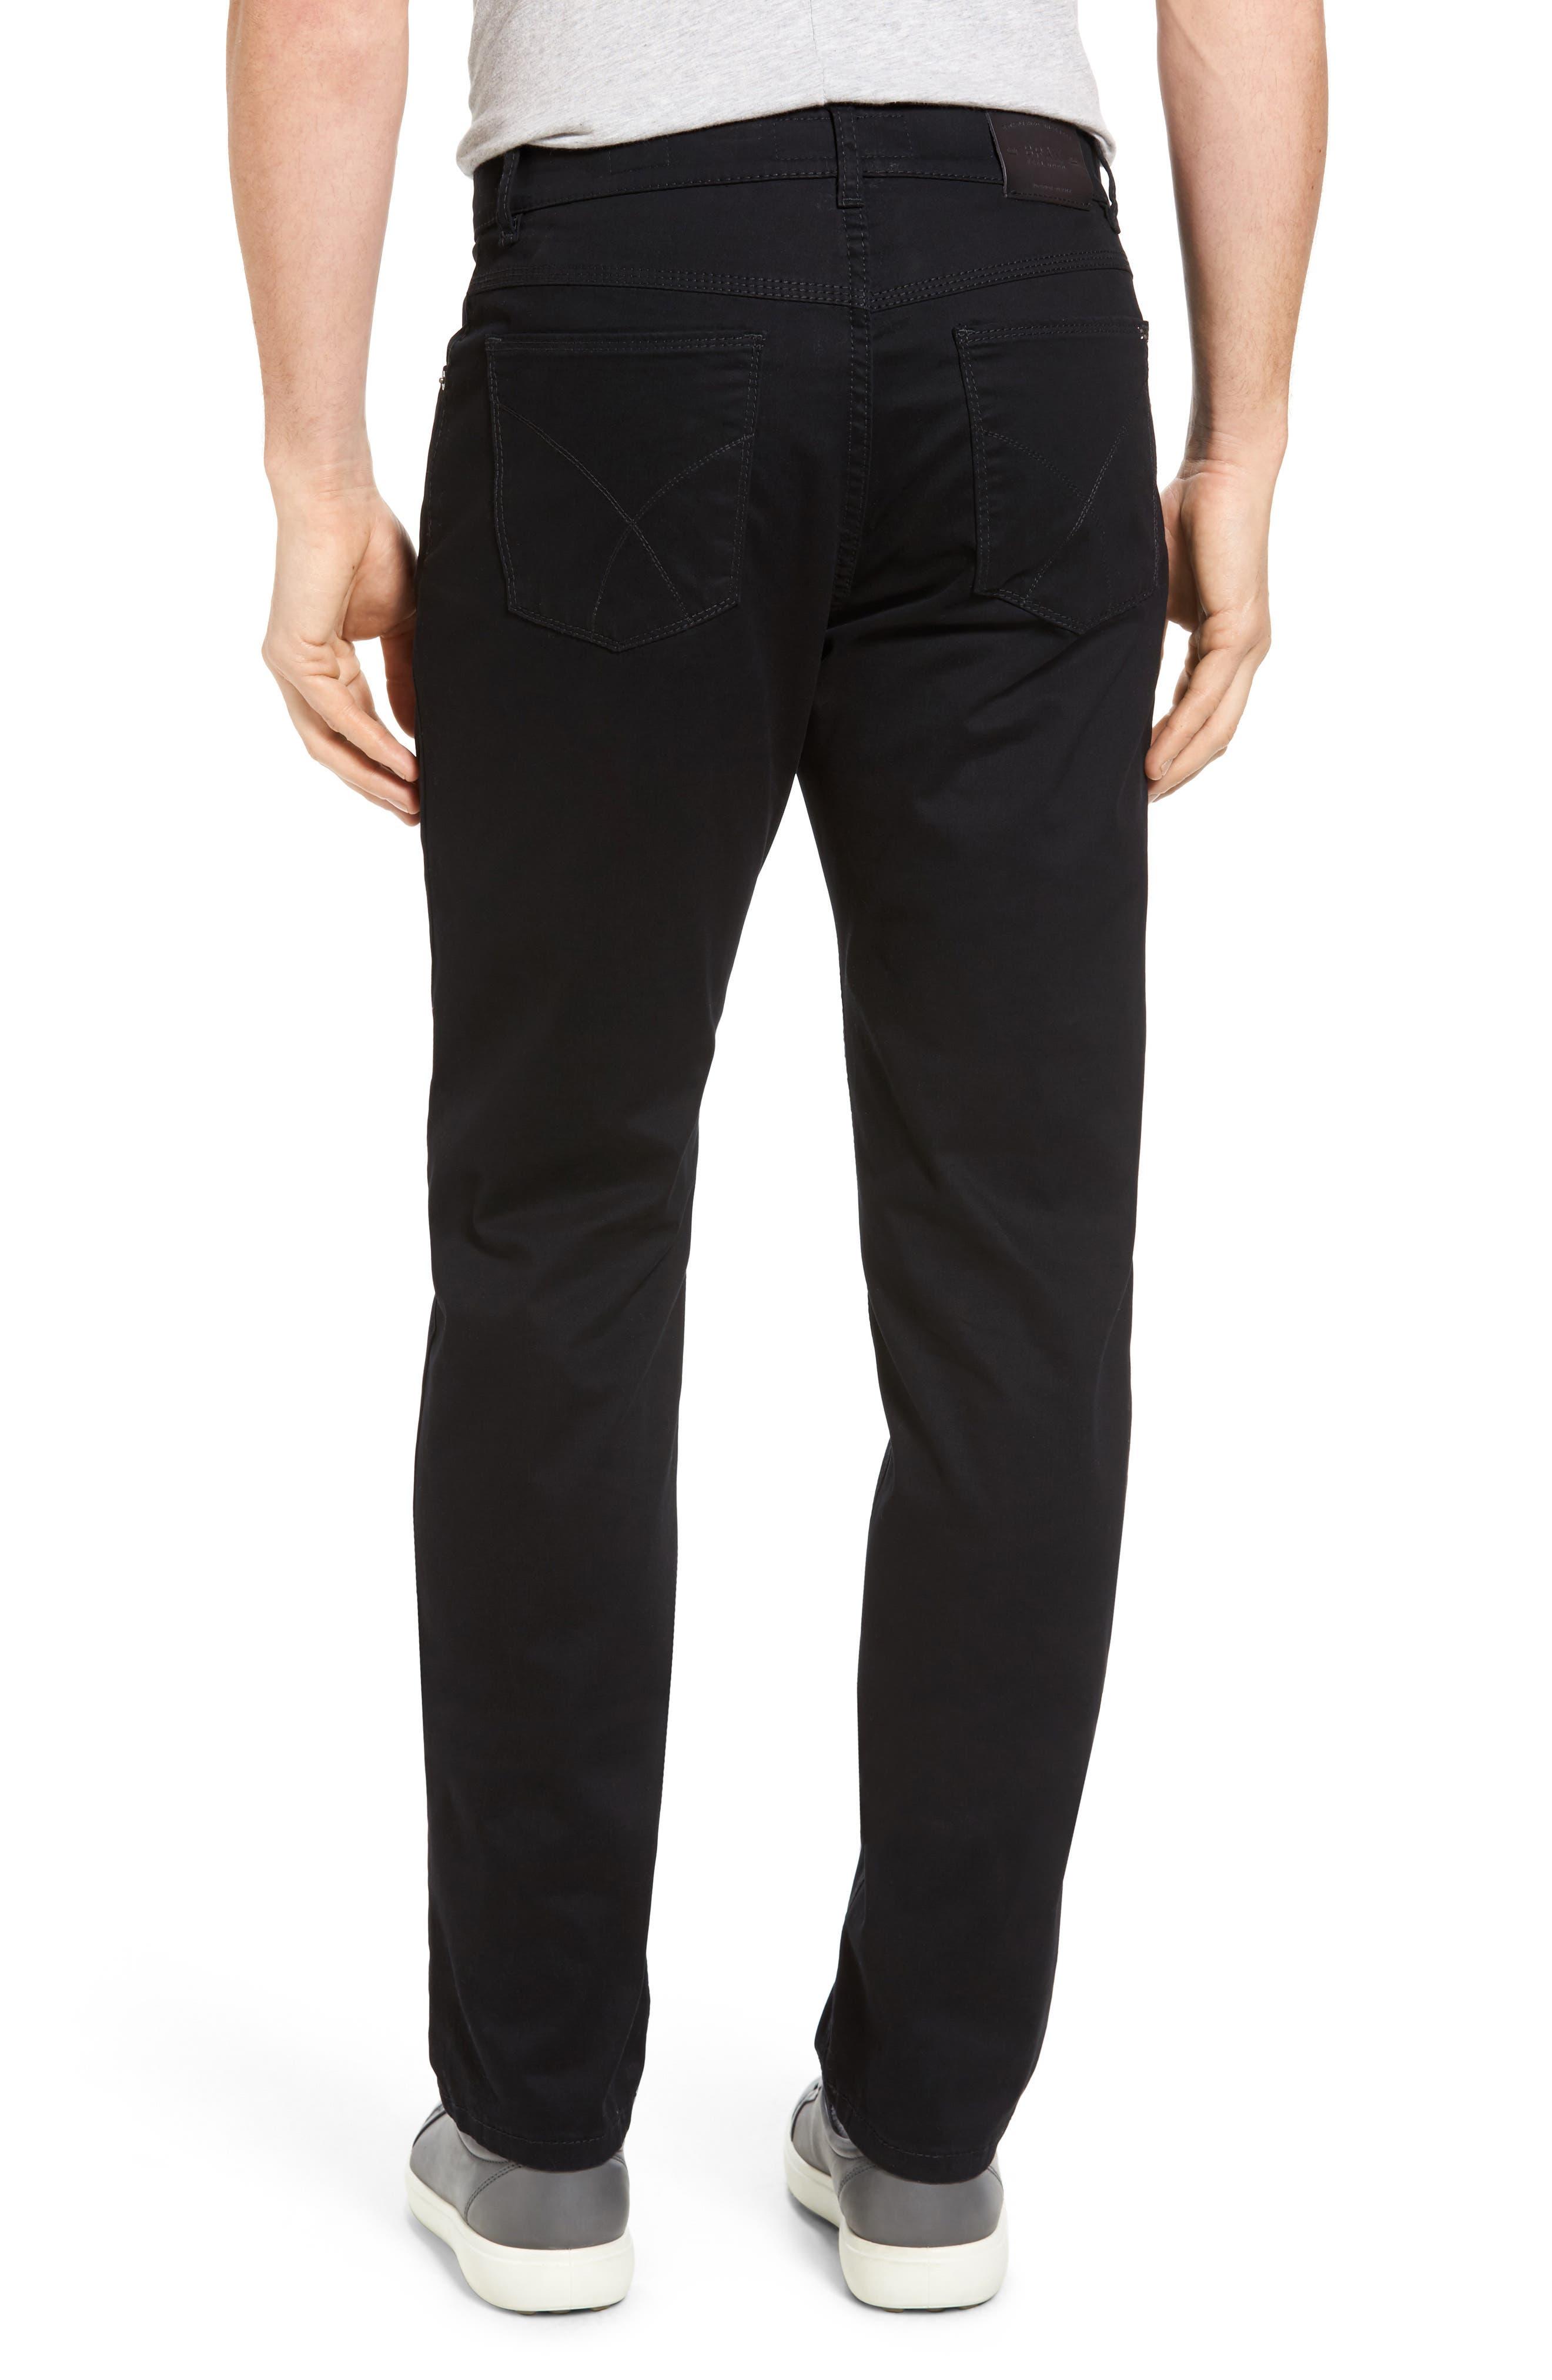 Cooper Prestige Stretch Cotton Pants,                             Alternate thumbnail 3, color,                             PERMA BLACK